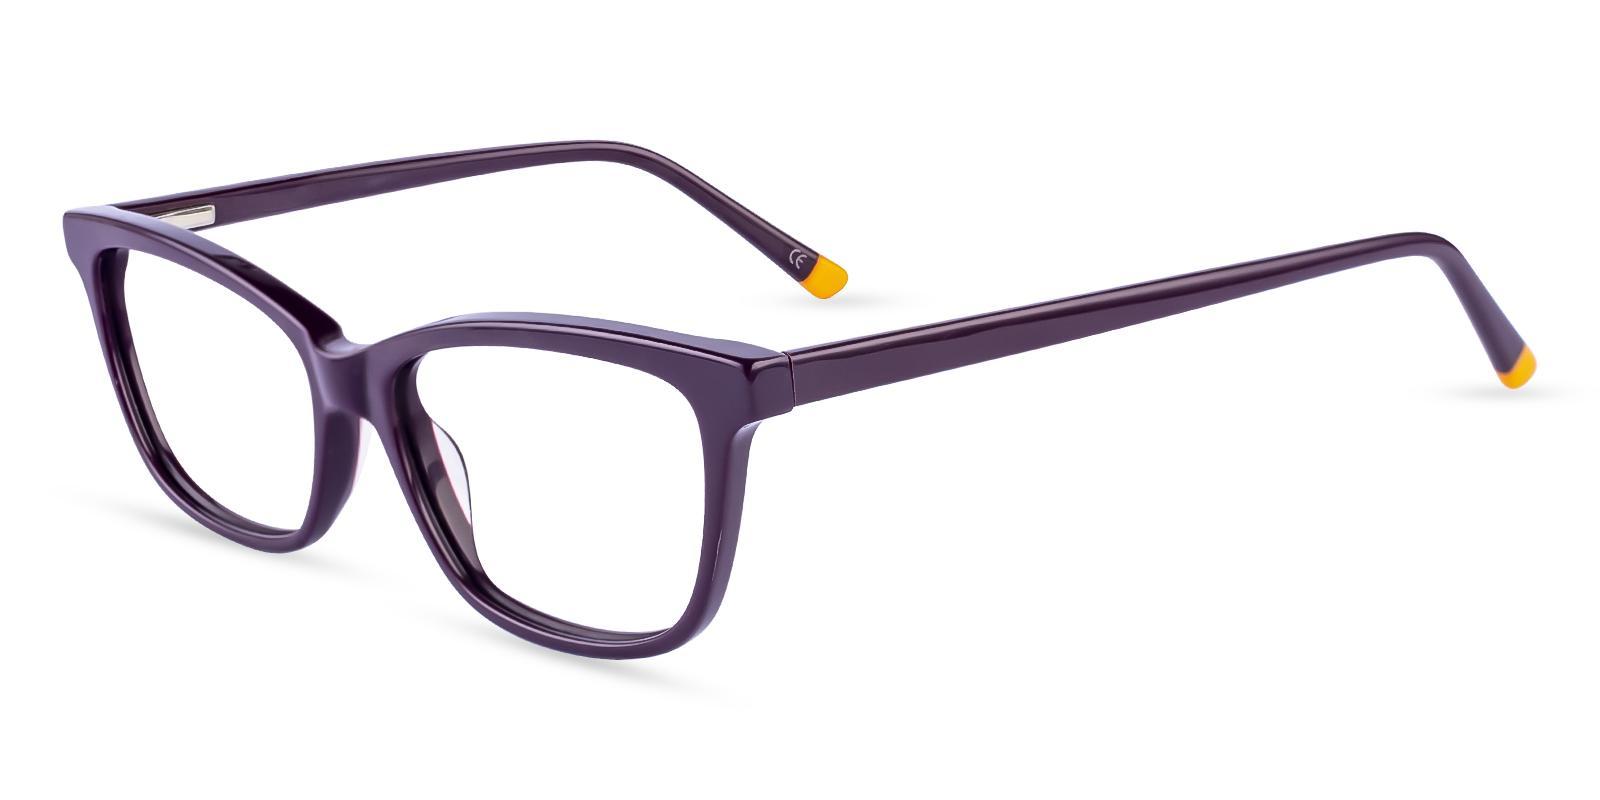 Zion Purple Acetate Eyeglasses , SpringHinges , UniversalBridgeFit Frames from ABBE Glasses